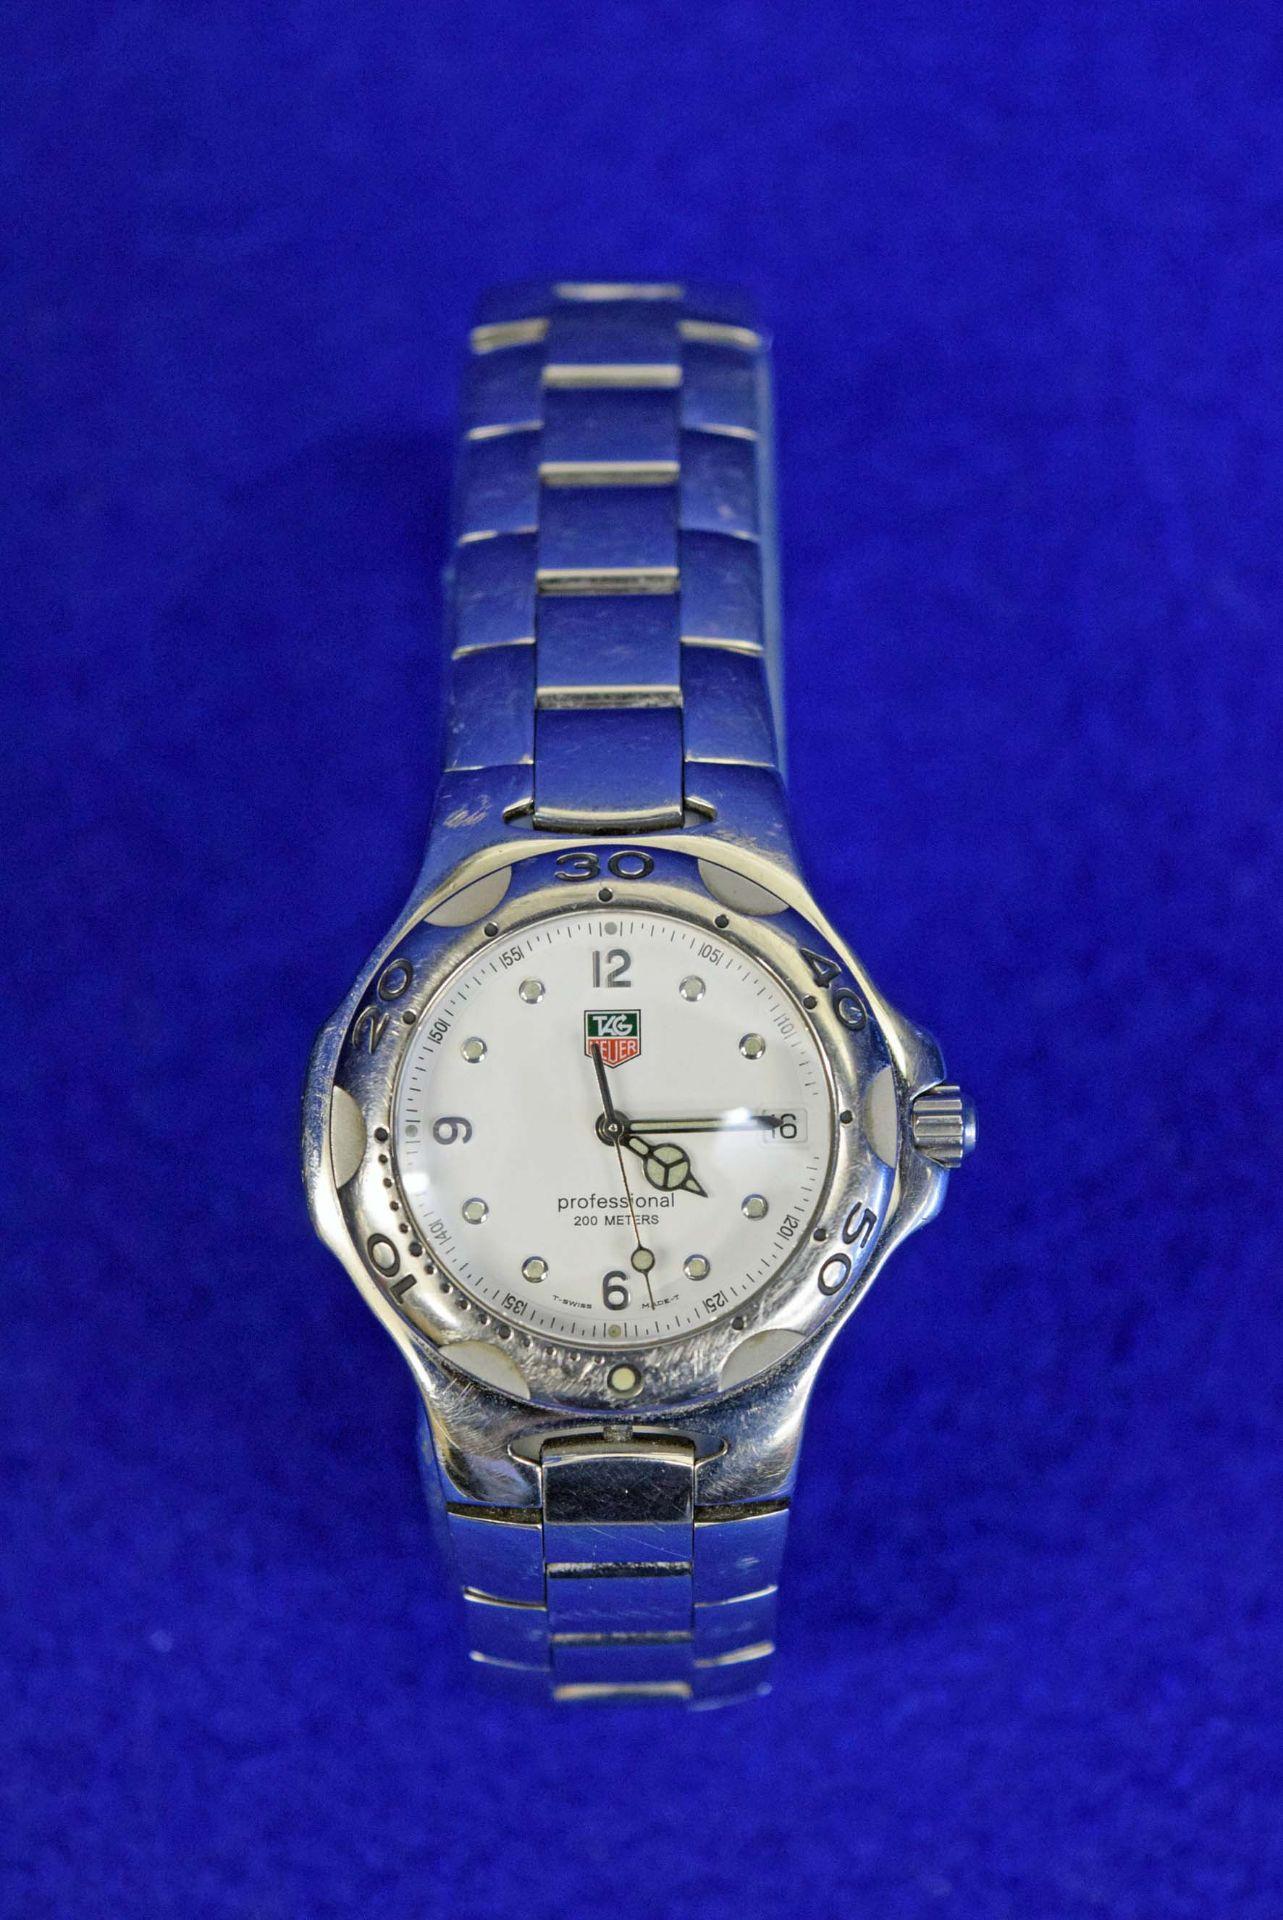 Lot 9 - A TAG HEUER 'Kirium WL1115 Professional' Stainless Steel Men's/Unisex Wrist Watch with Quartz